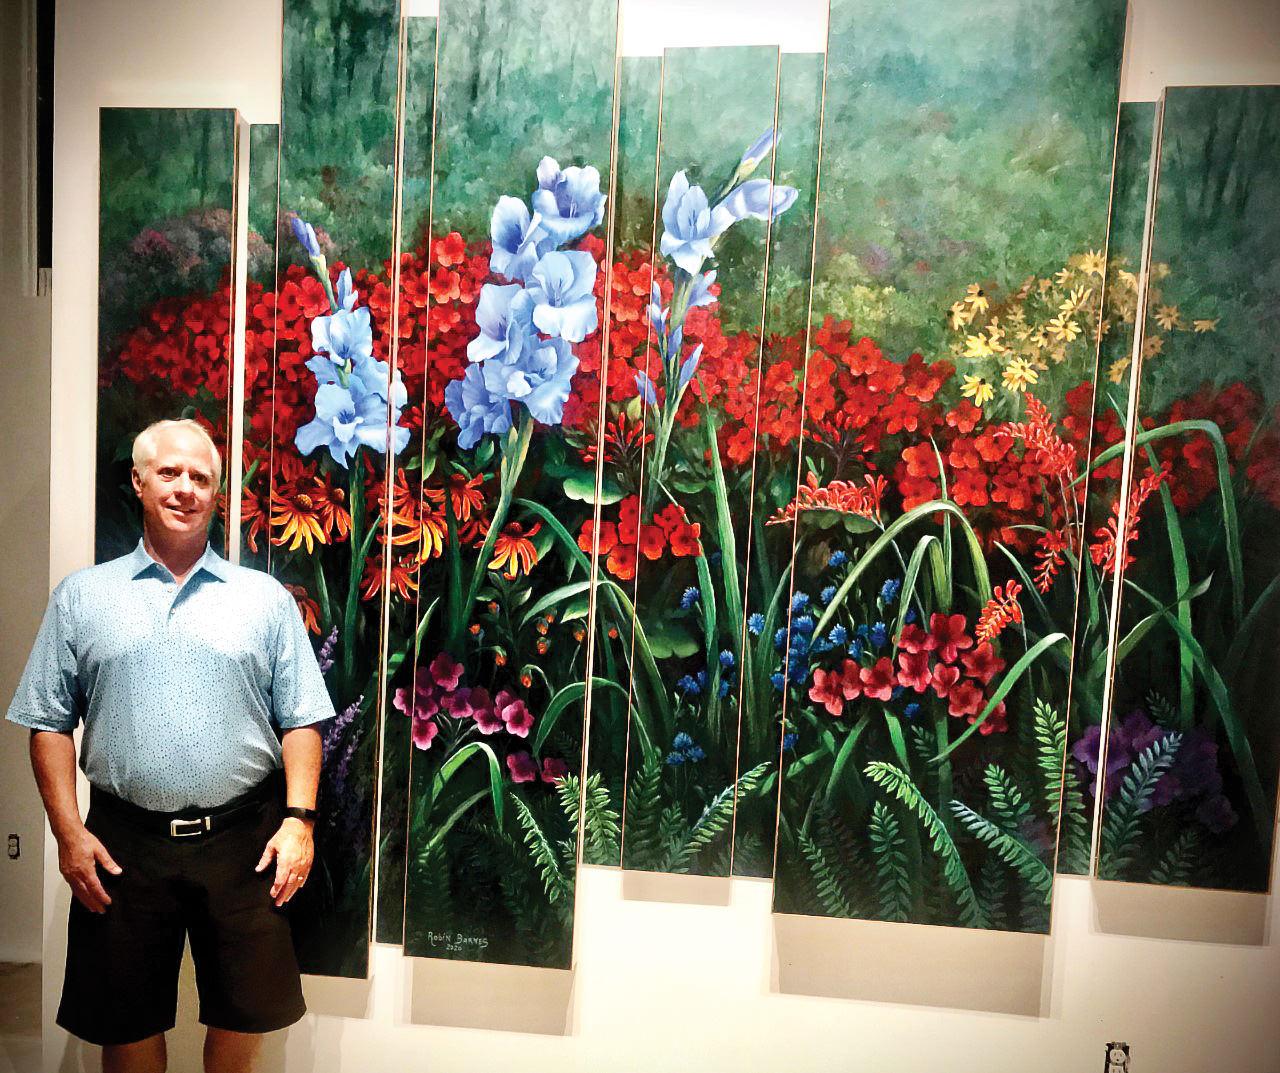 Robin Barns and paintings